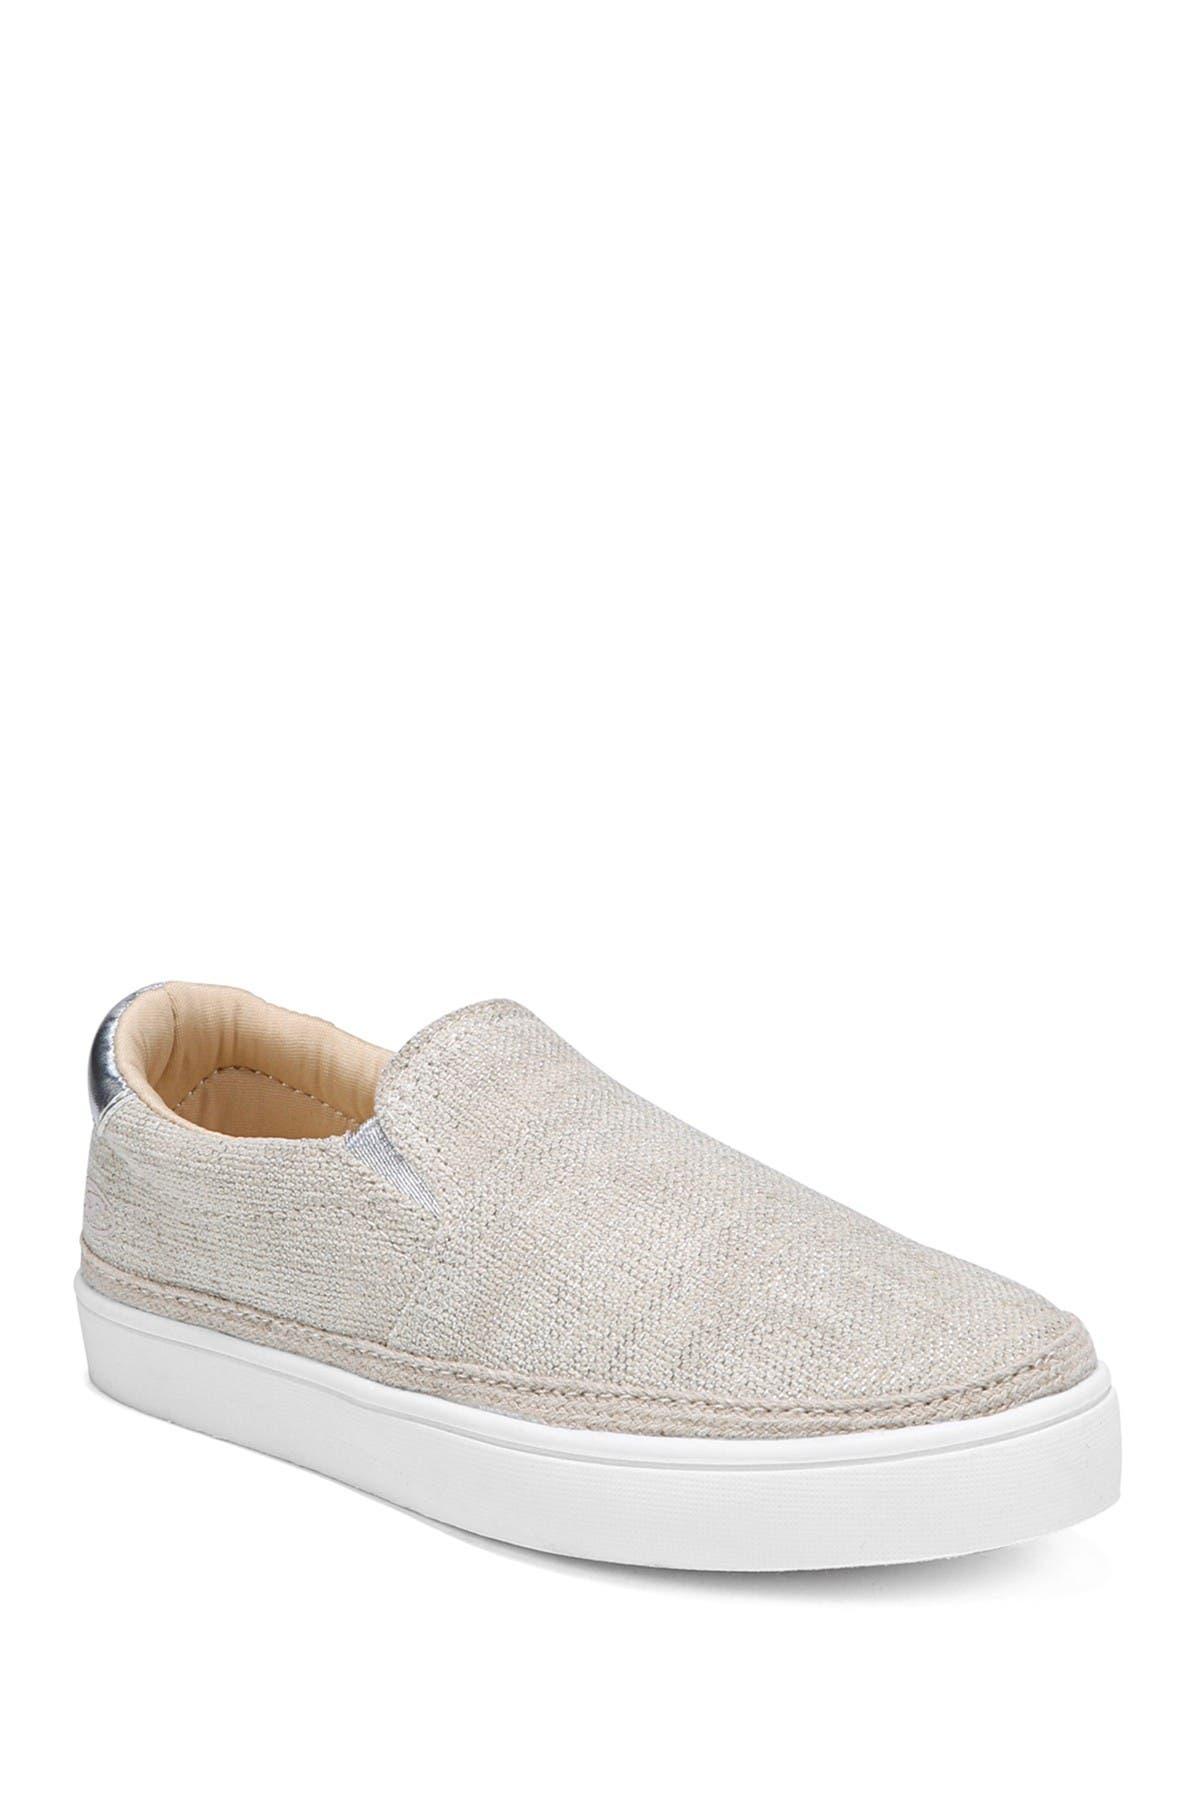 Image of Dr. Scholl's Madison Slip-On Sneaker